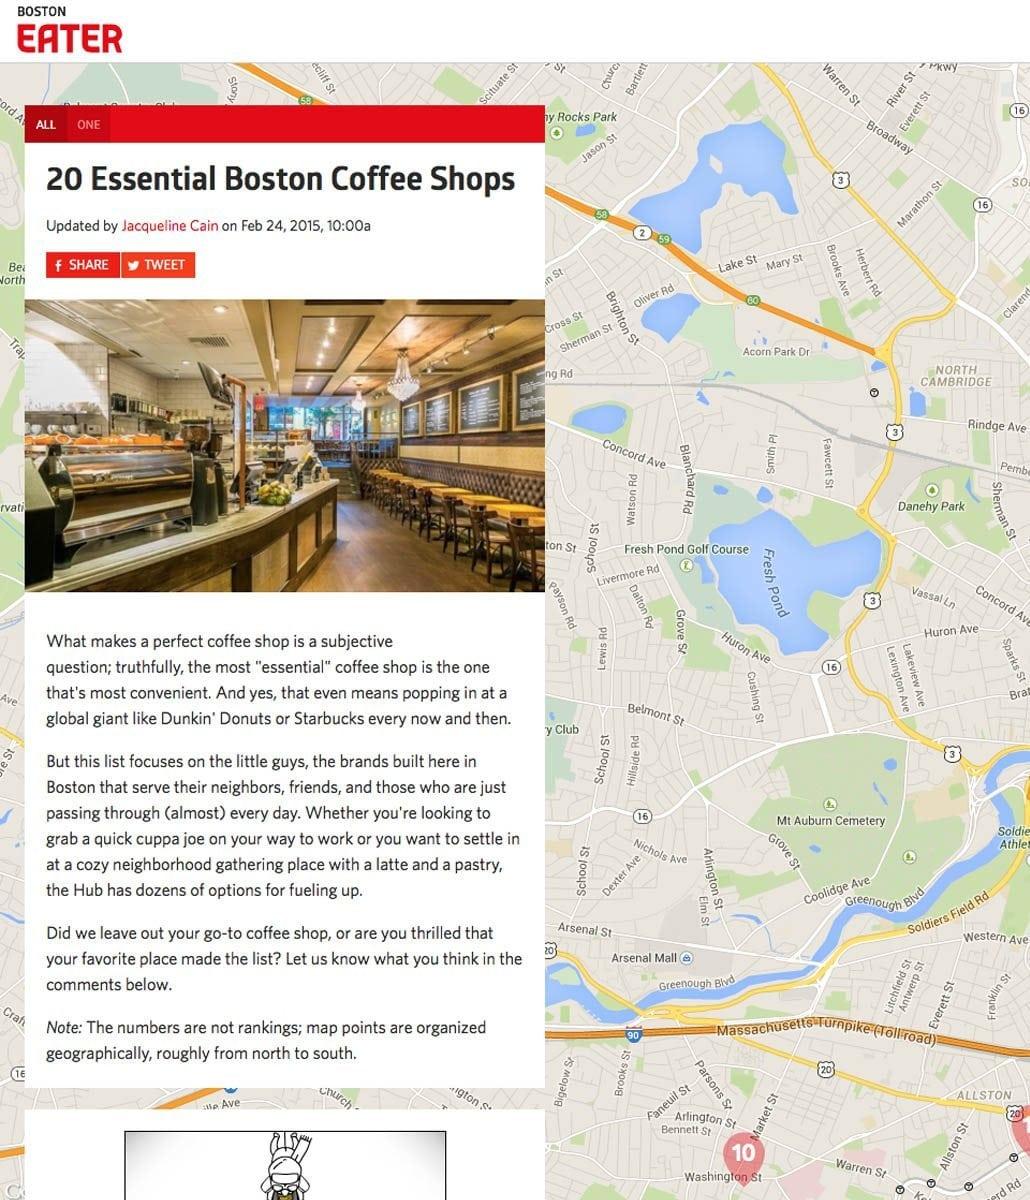 BCRC_press_essentialcoffee